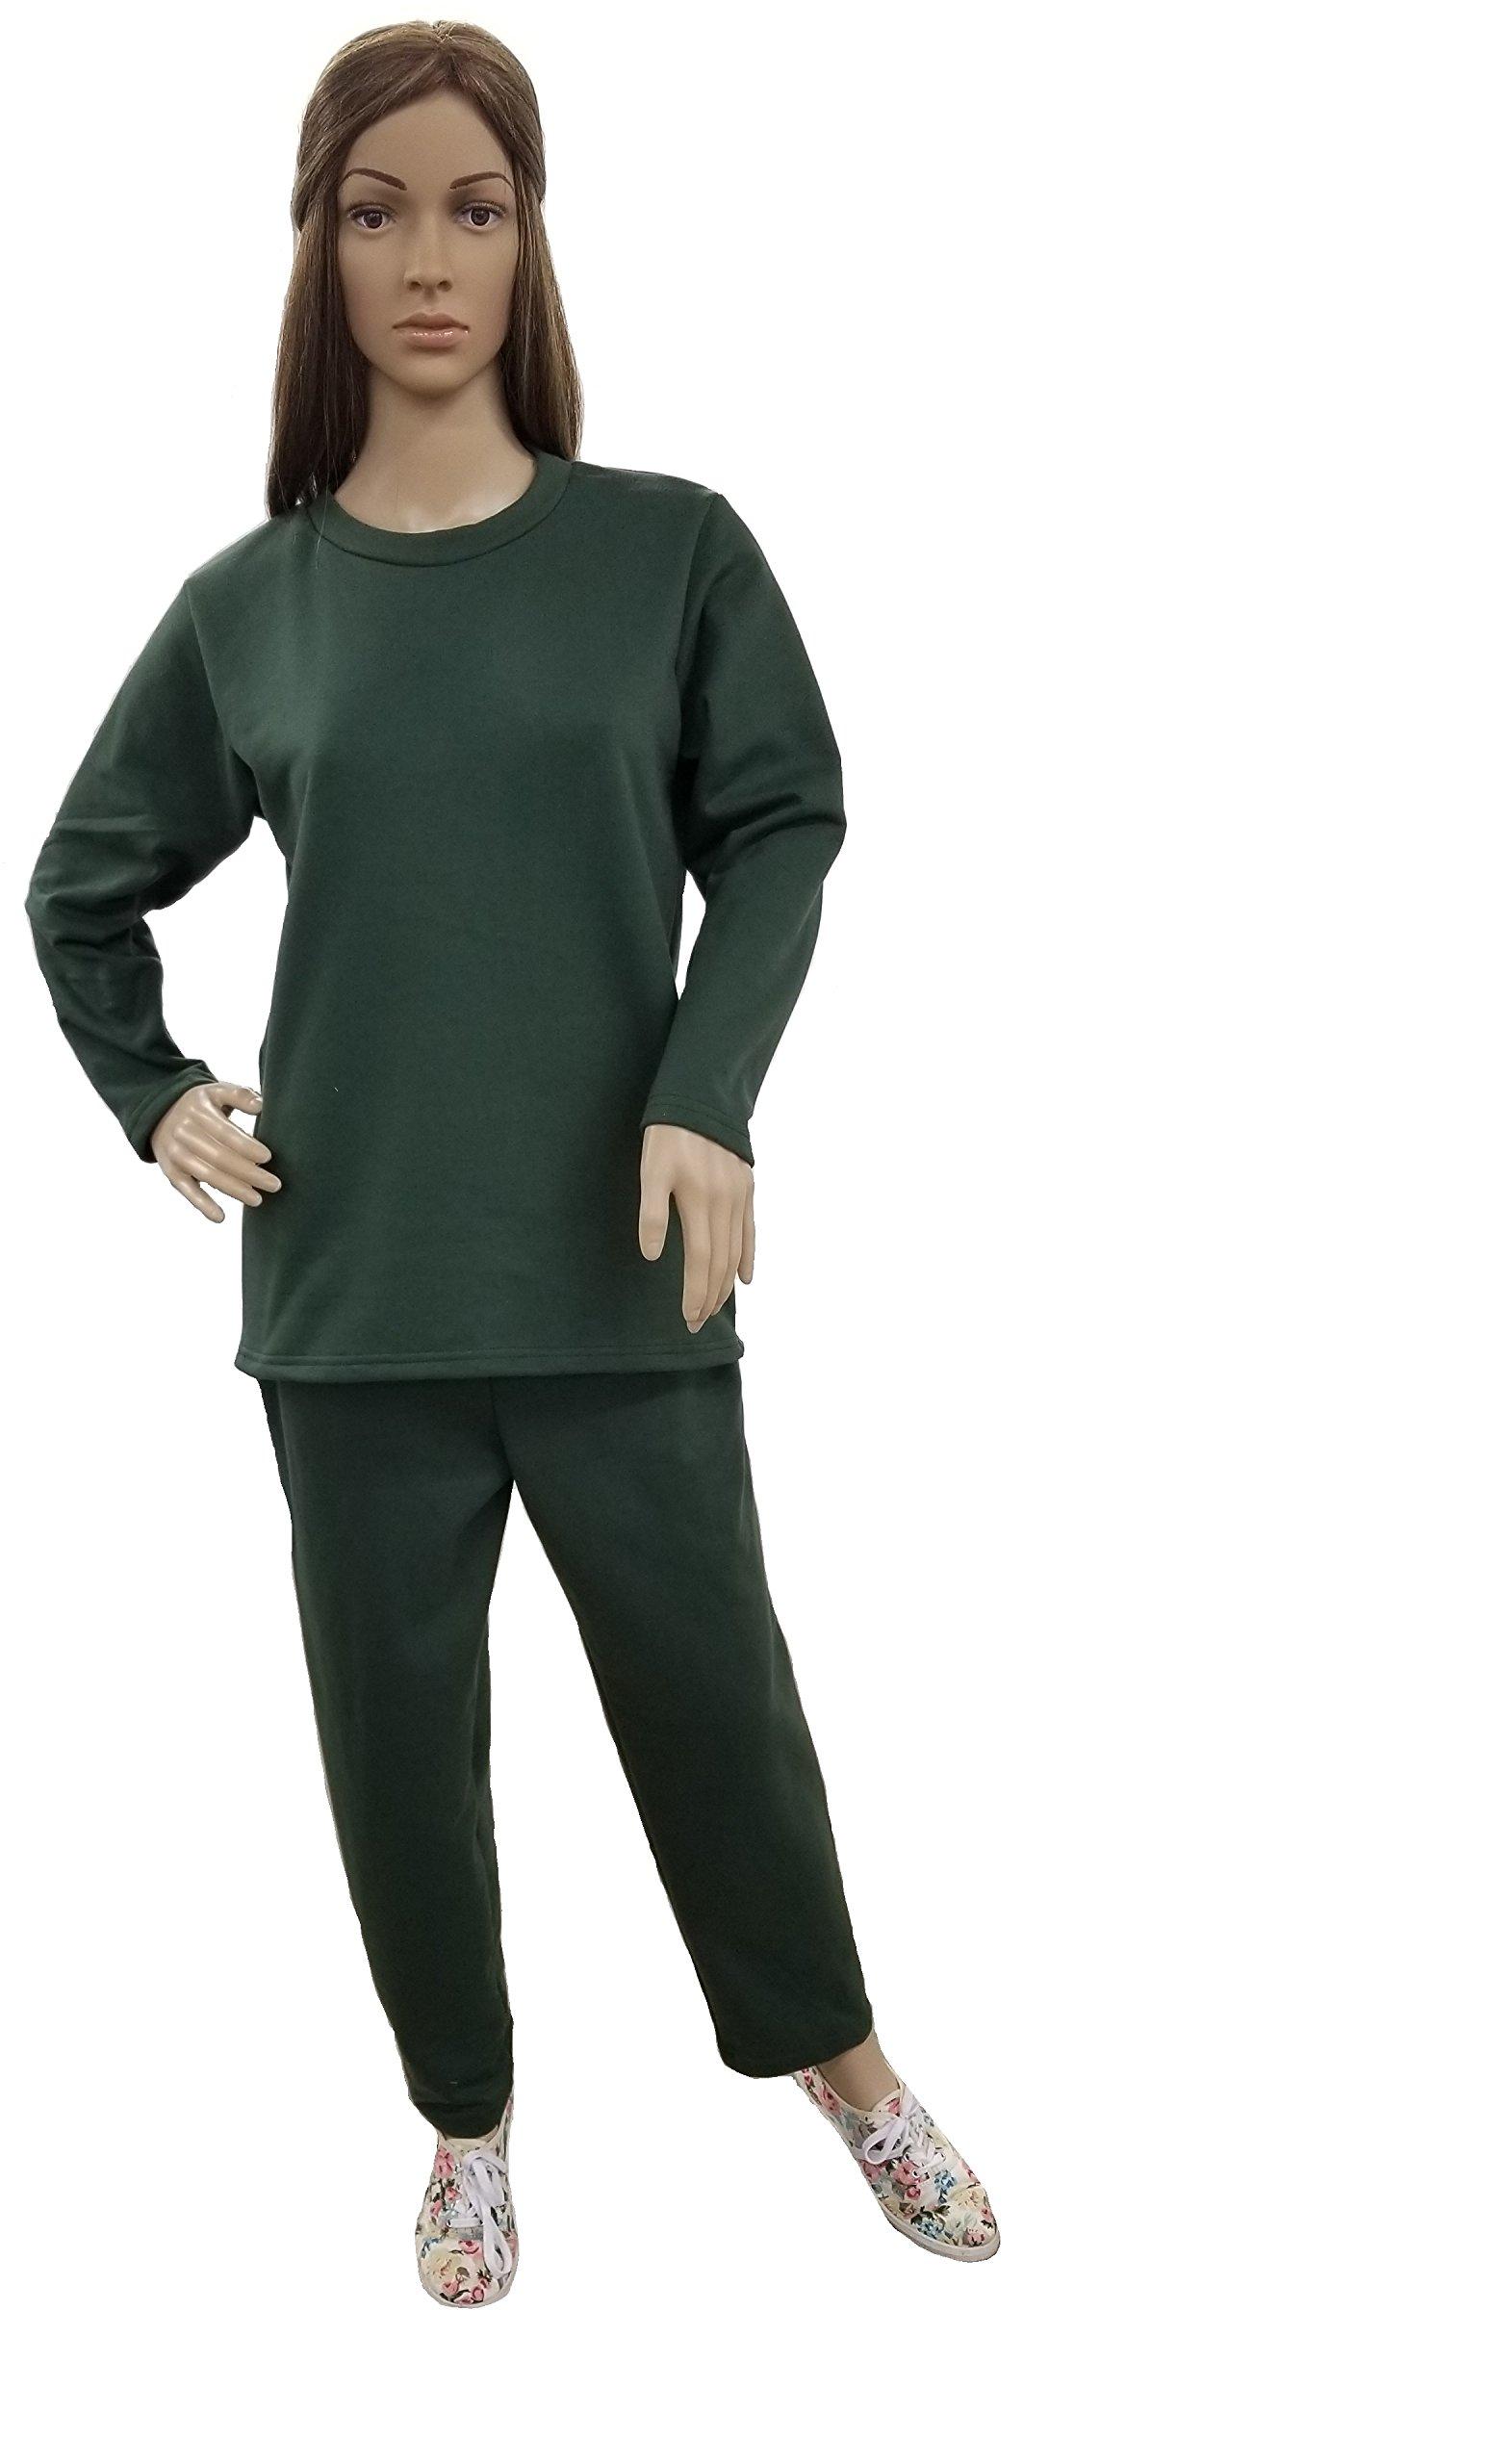 Women's Fleece Sweatsuit Set-Long Sleeve Comfort Fit Side Pocket Design Cotton Blend (2X, Green)